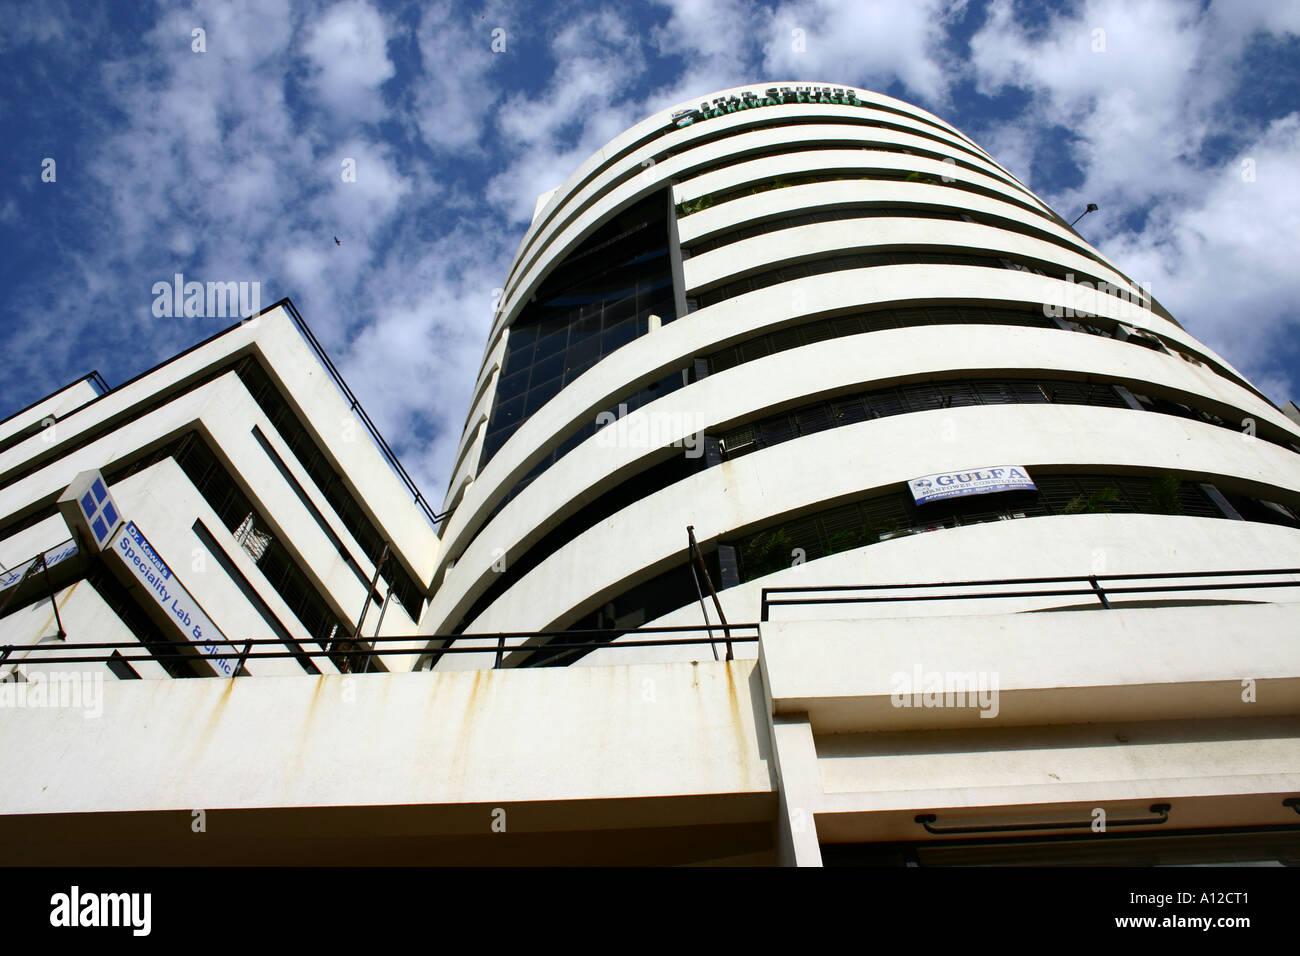 RSC75077 indiano moderno edificio di architettura Andheri west Maharastra Mumbai India Immagini Stock